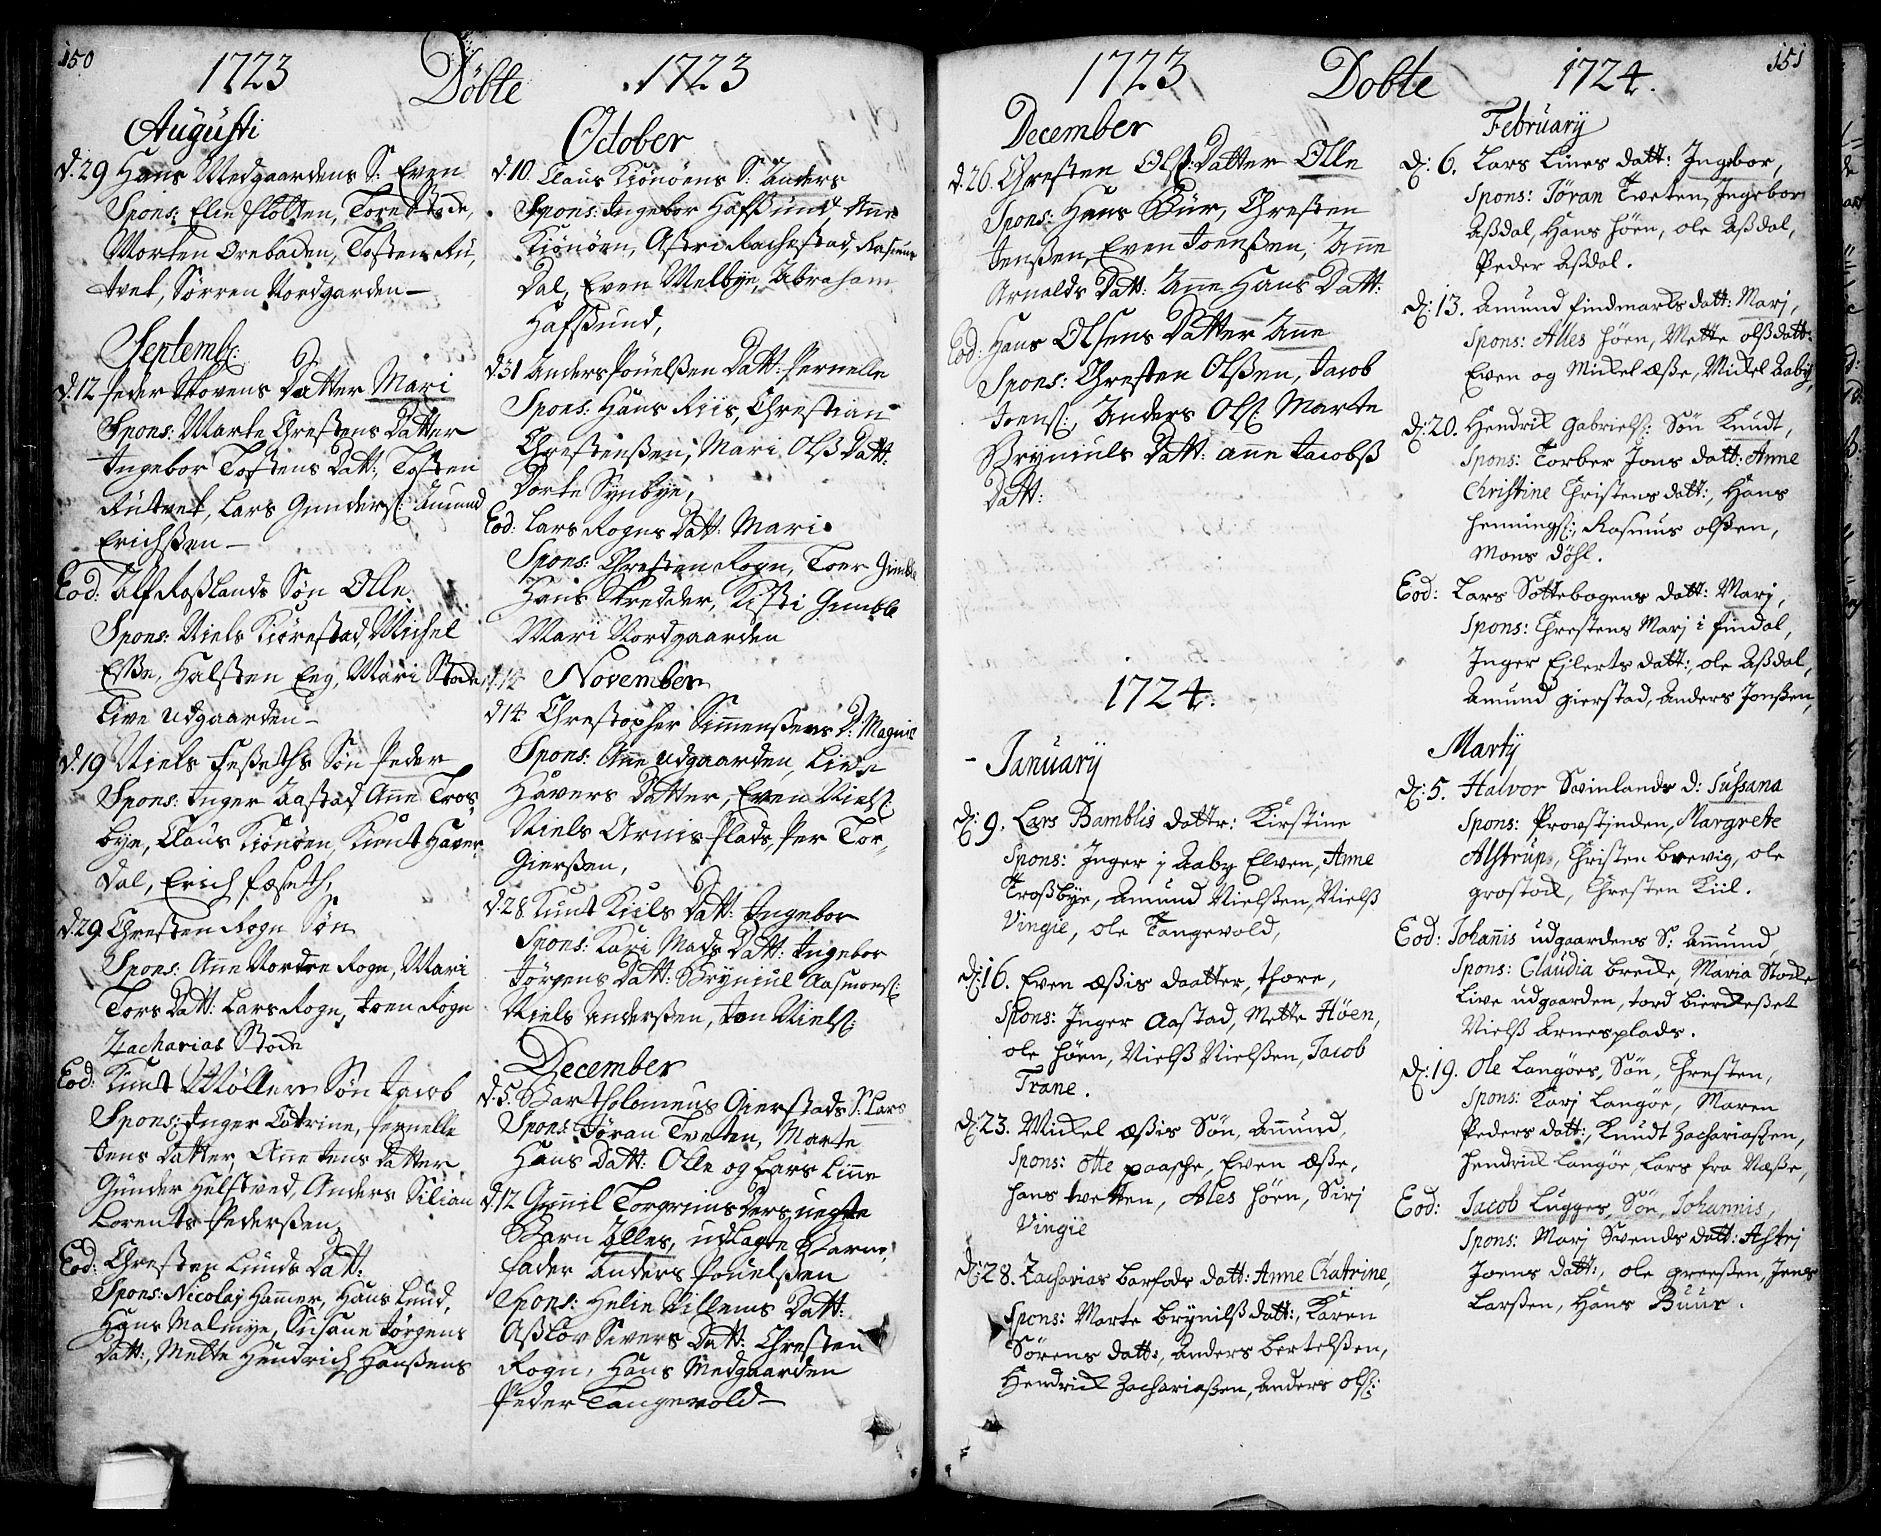 SAKO, Bamble kirkebøker, F/Fa/L0001: Ministerialbok nr. I 1, 1702-1774, s. 150-151